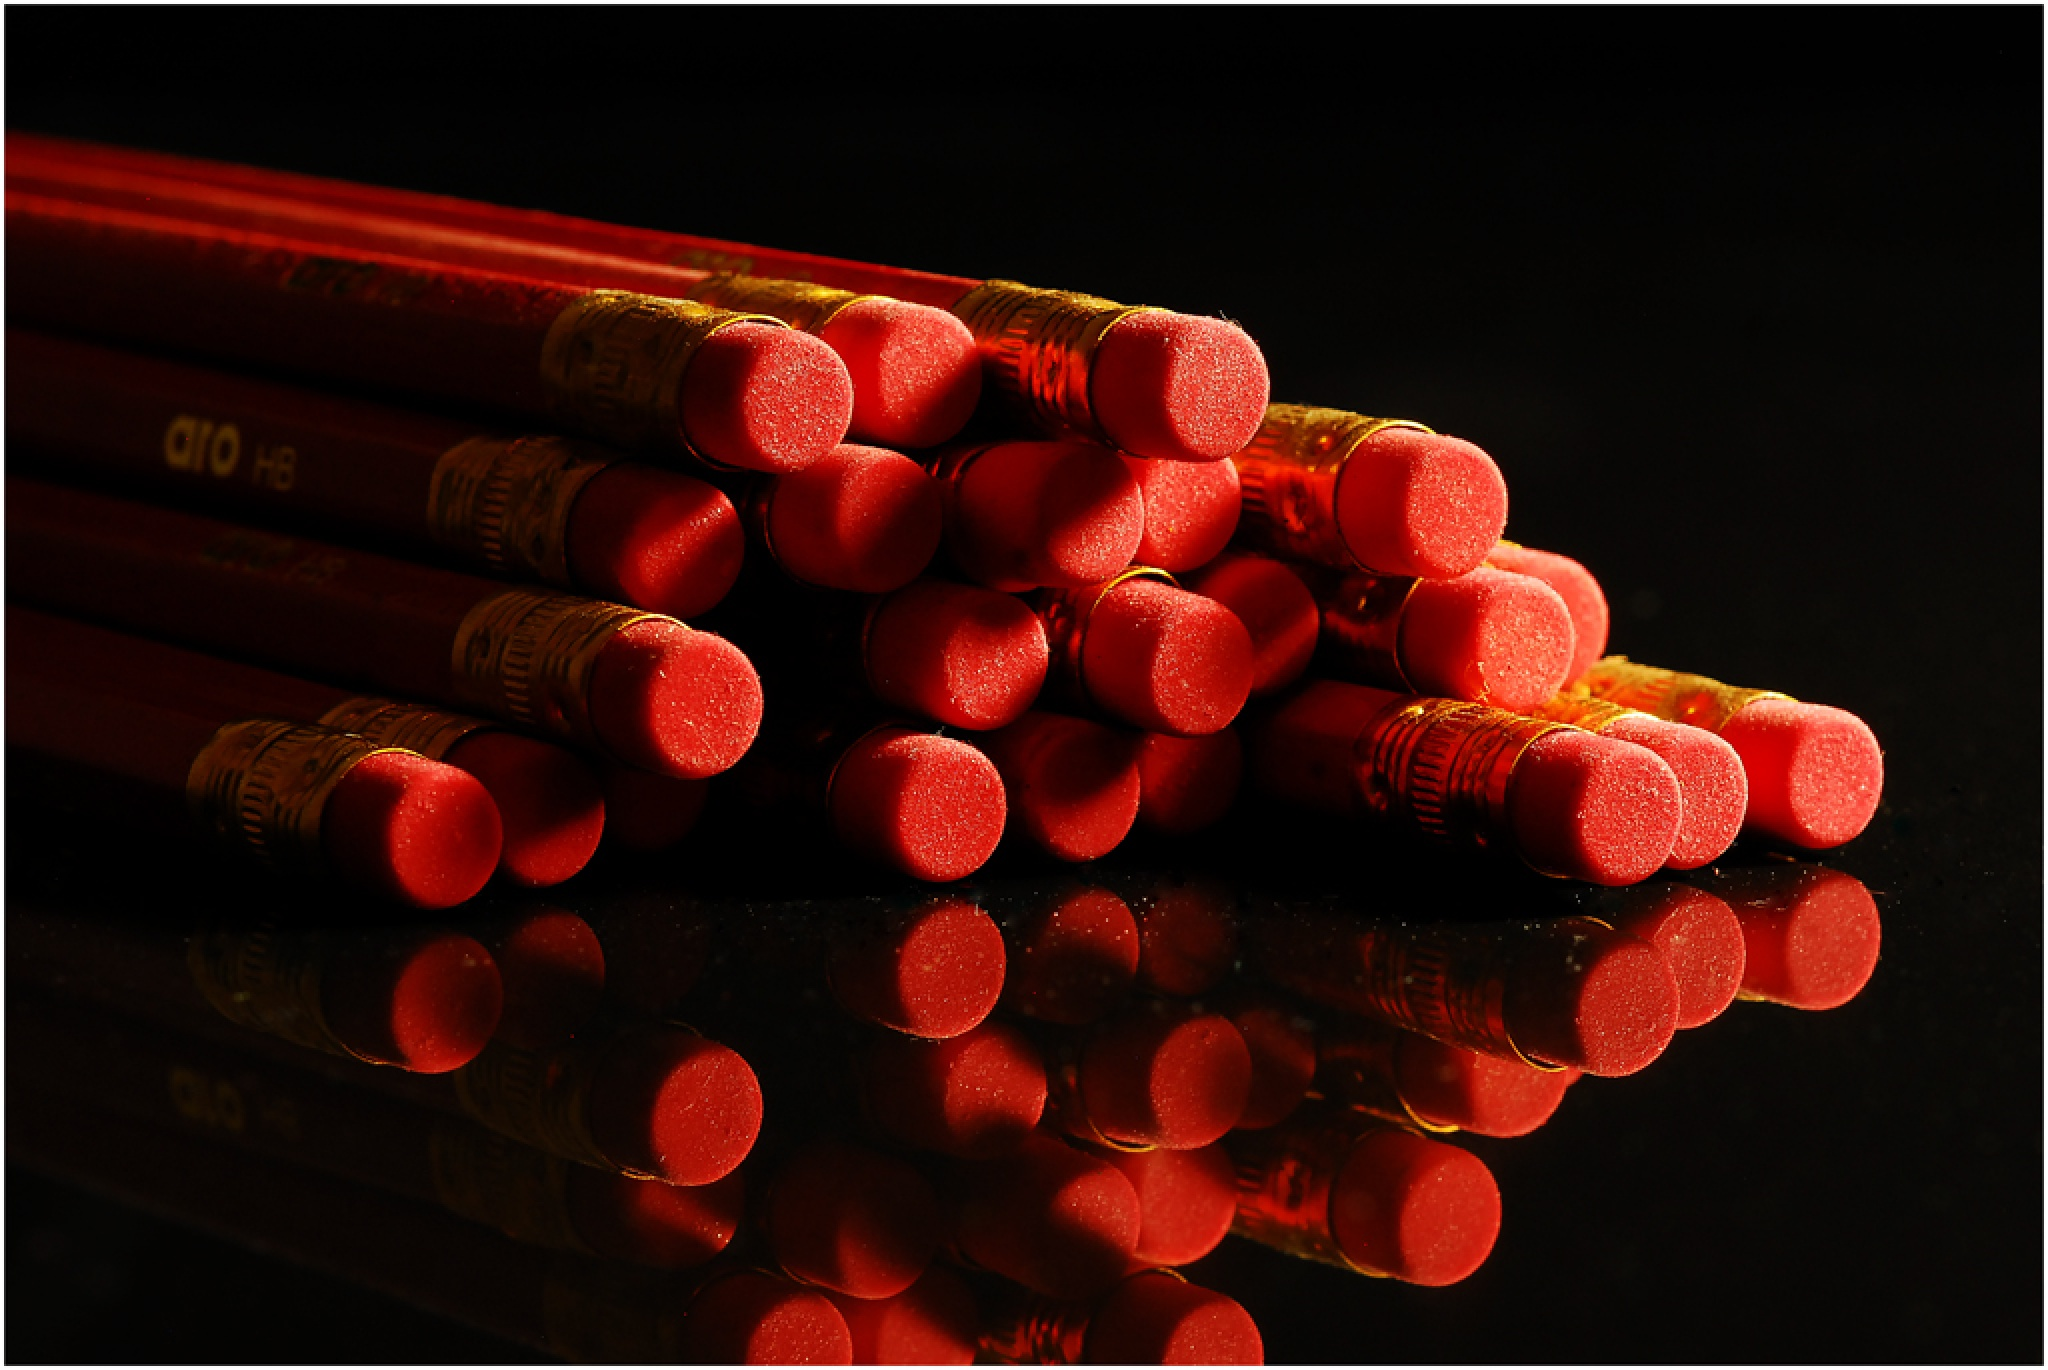 Red Pencils by Bertie Price